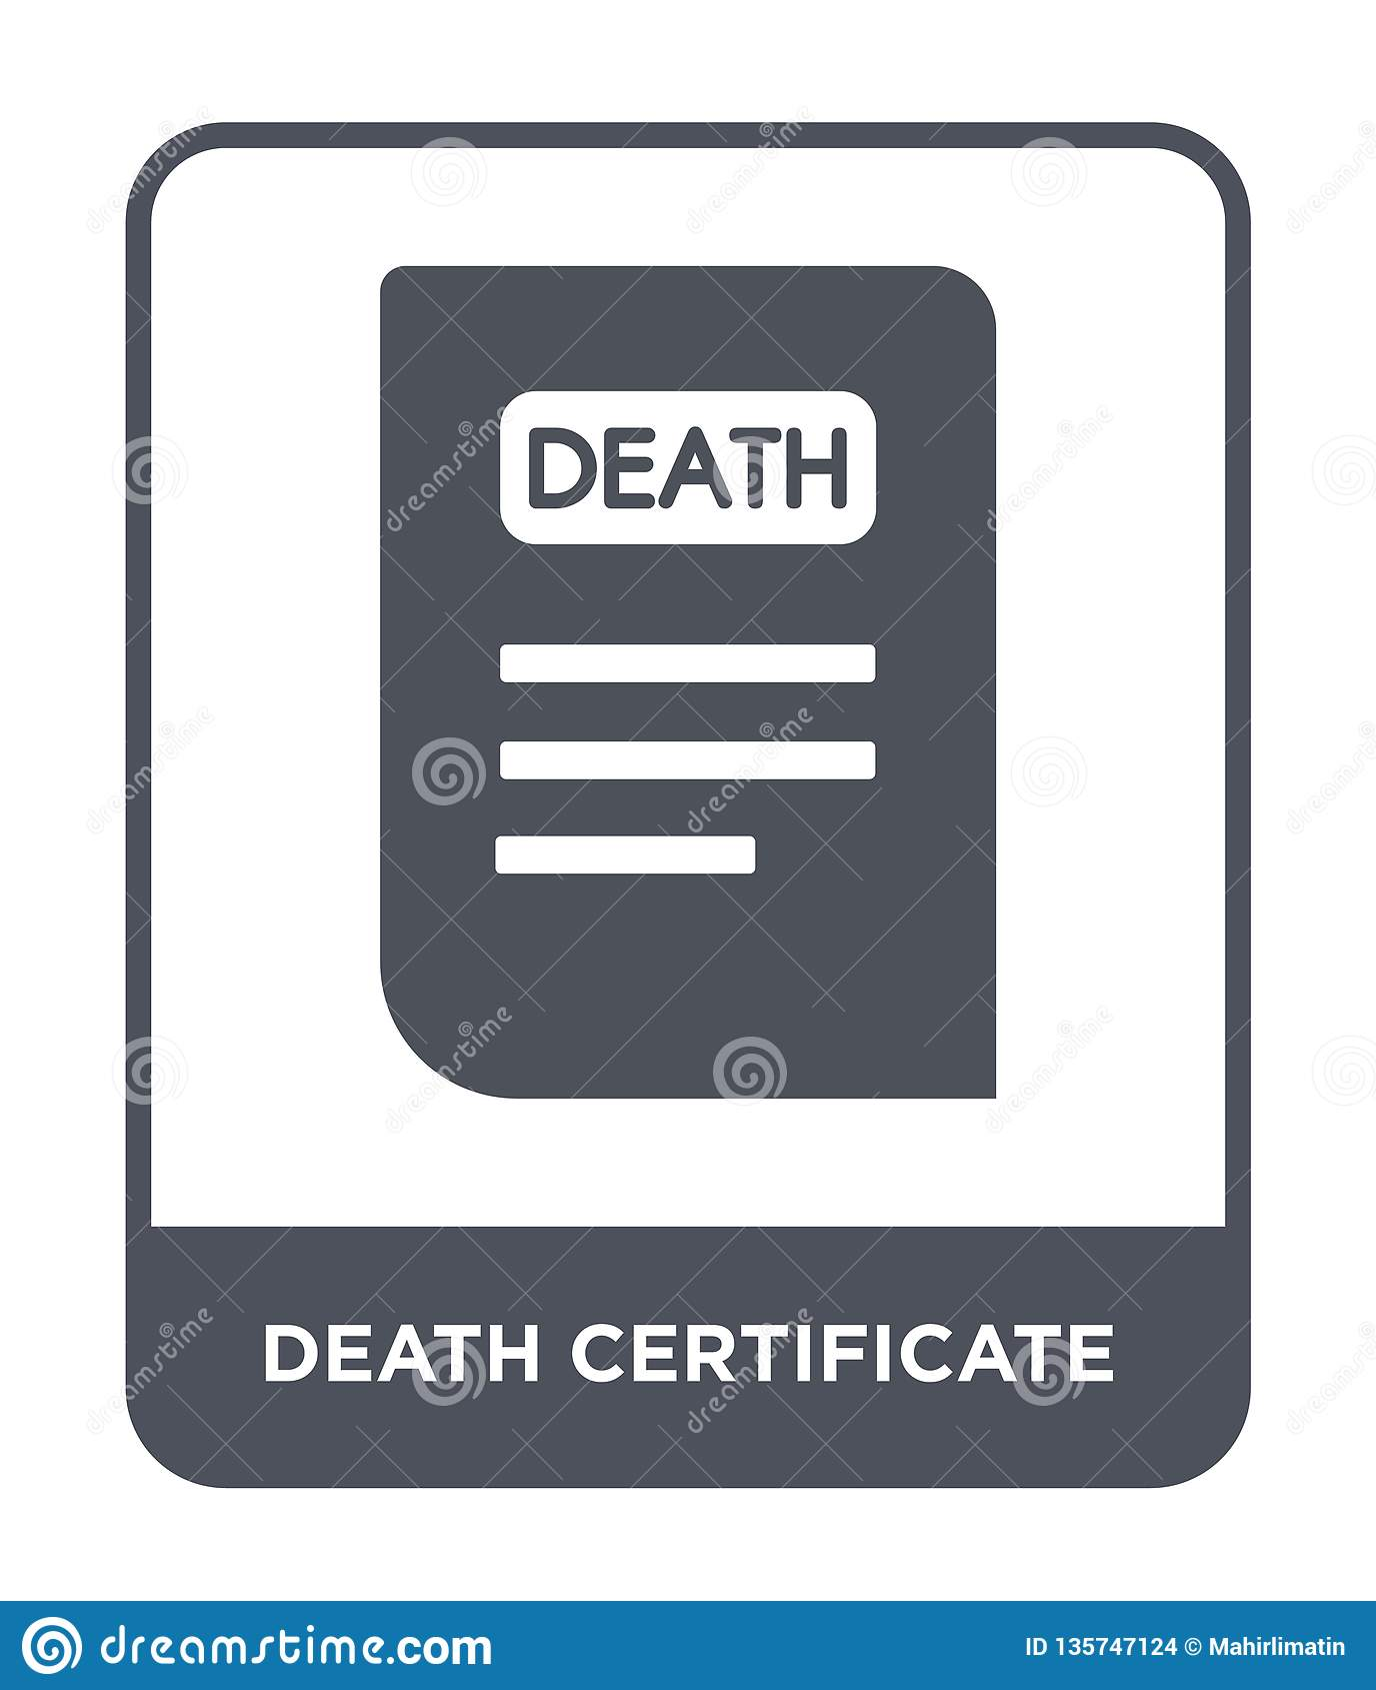 death certificate icon in trendy design style. death certificate icon isolated on white background. death certificate vector icon